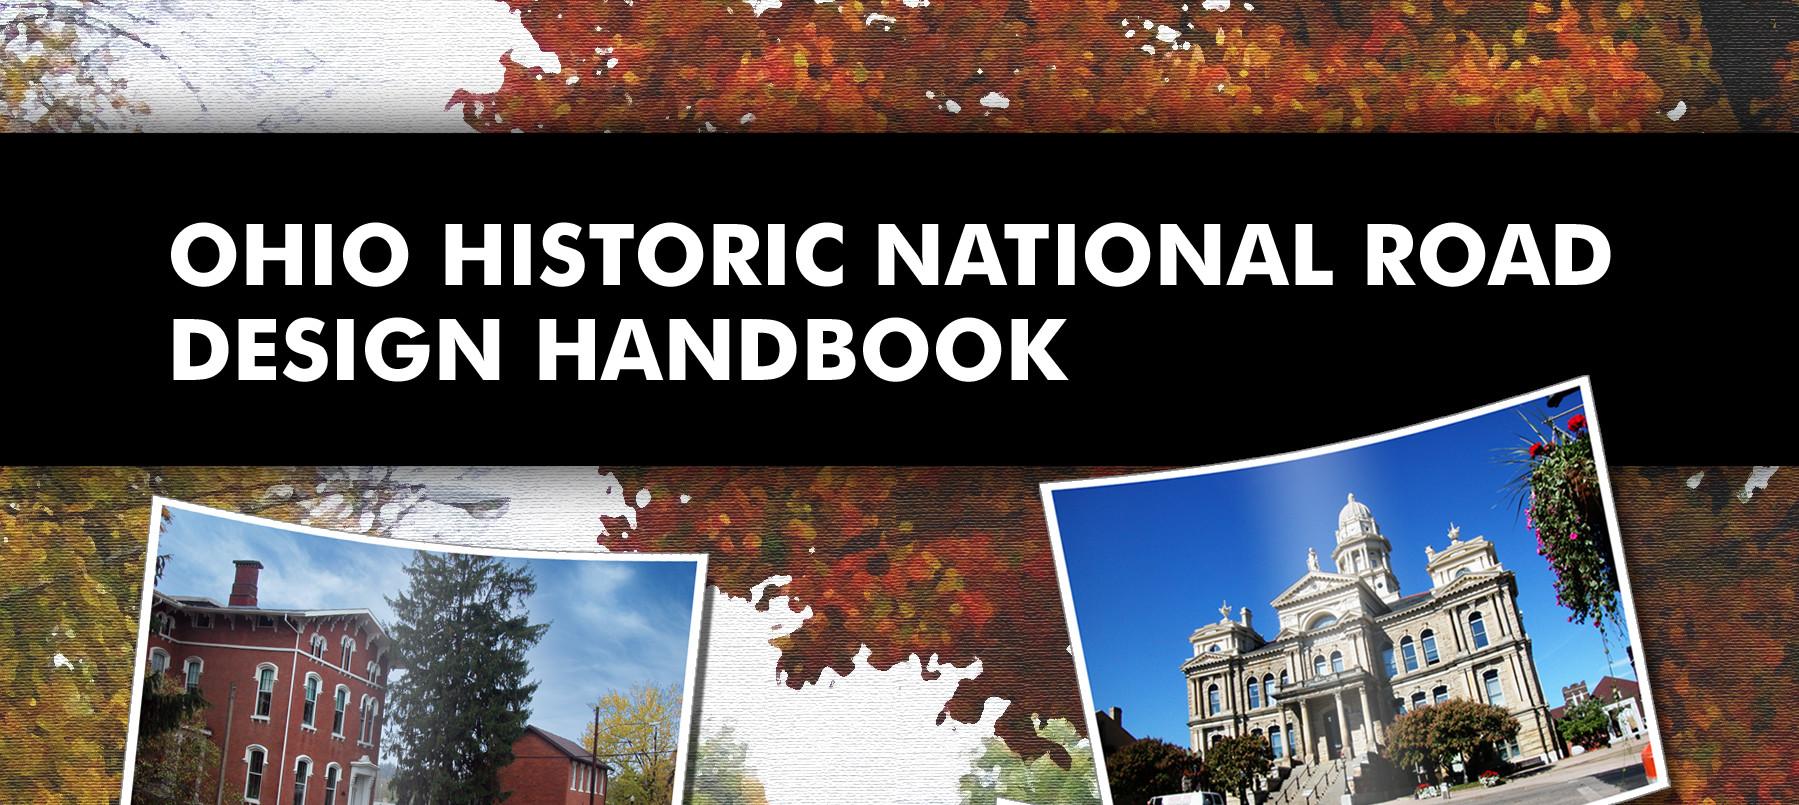 OhioHistoricNationalRoadDesignHandbookCOVER